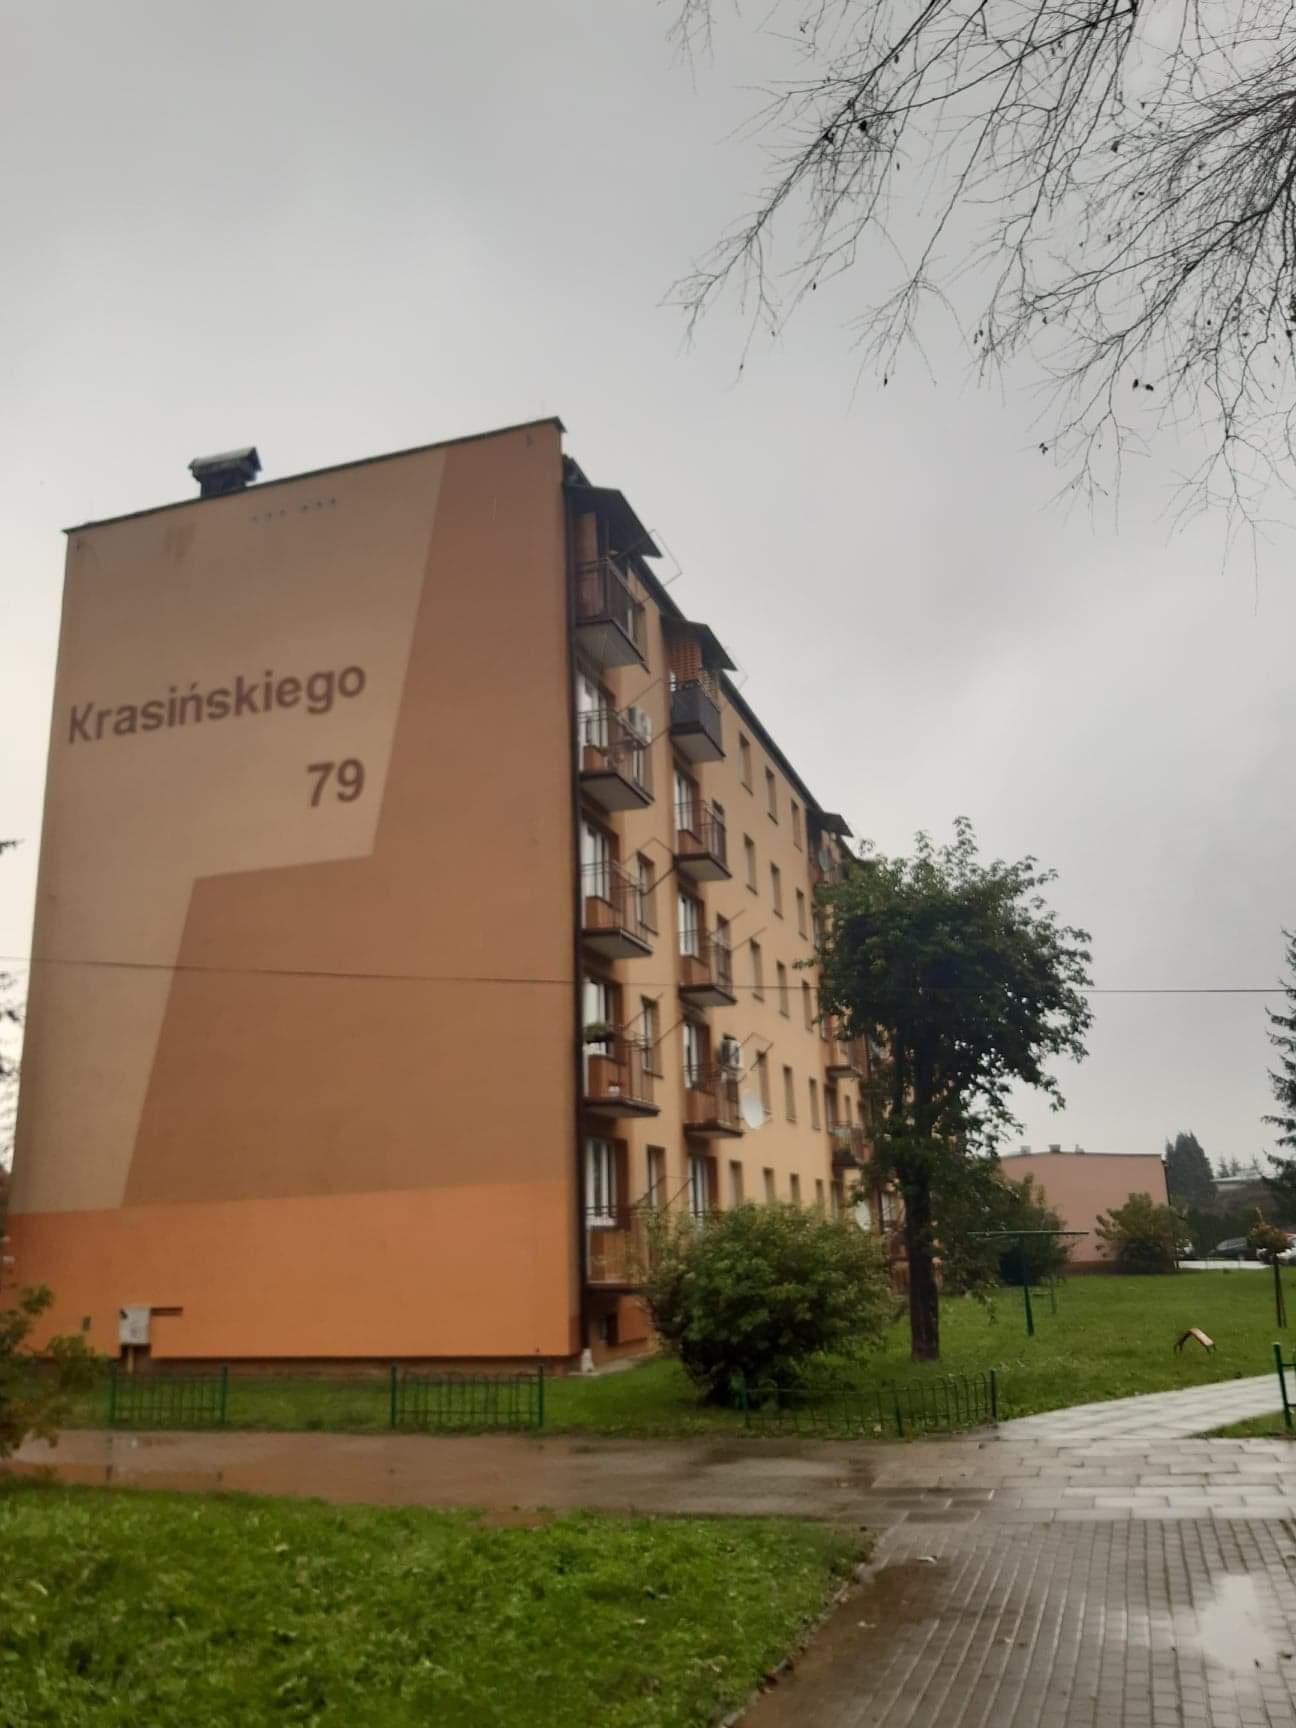 Krasinskiego79